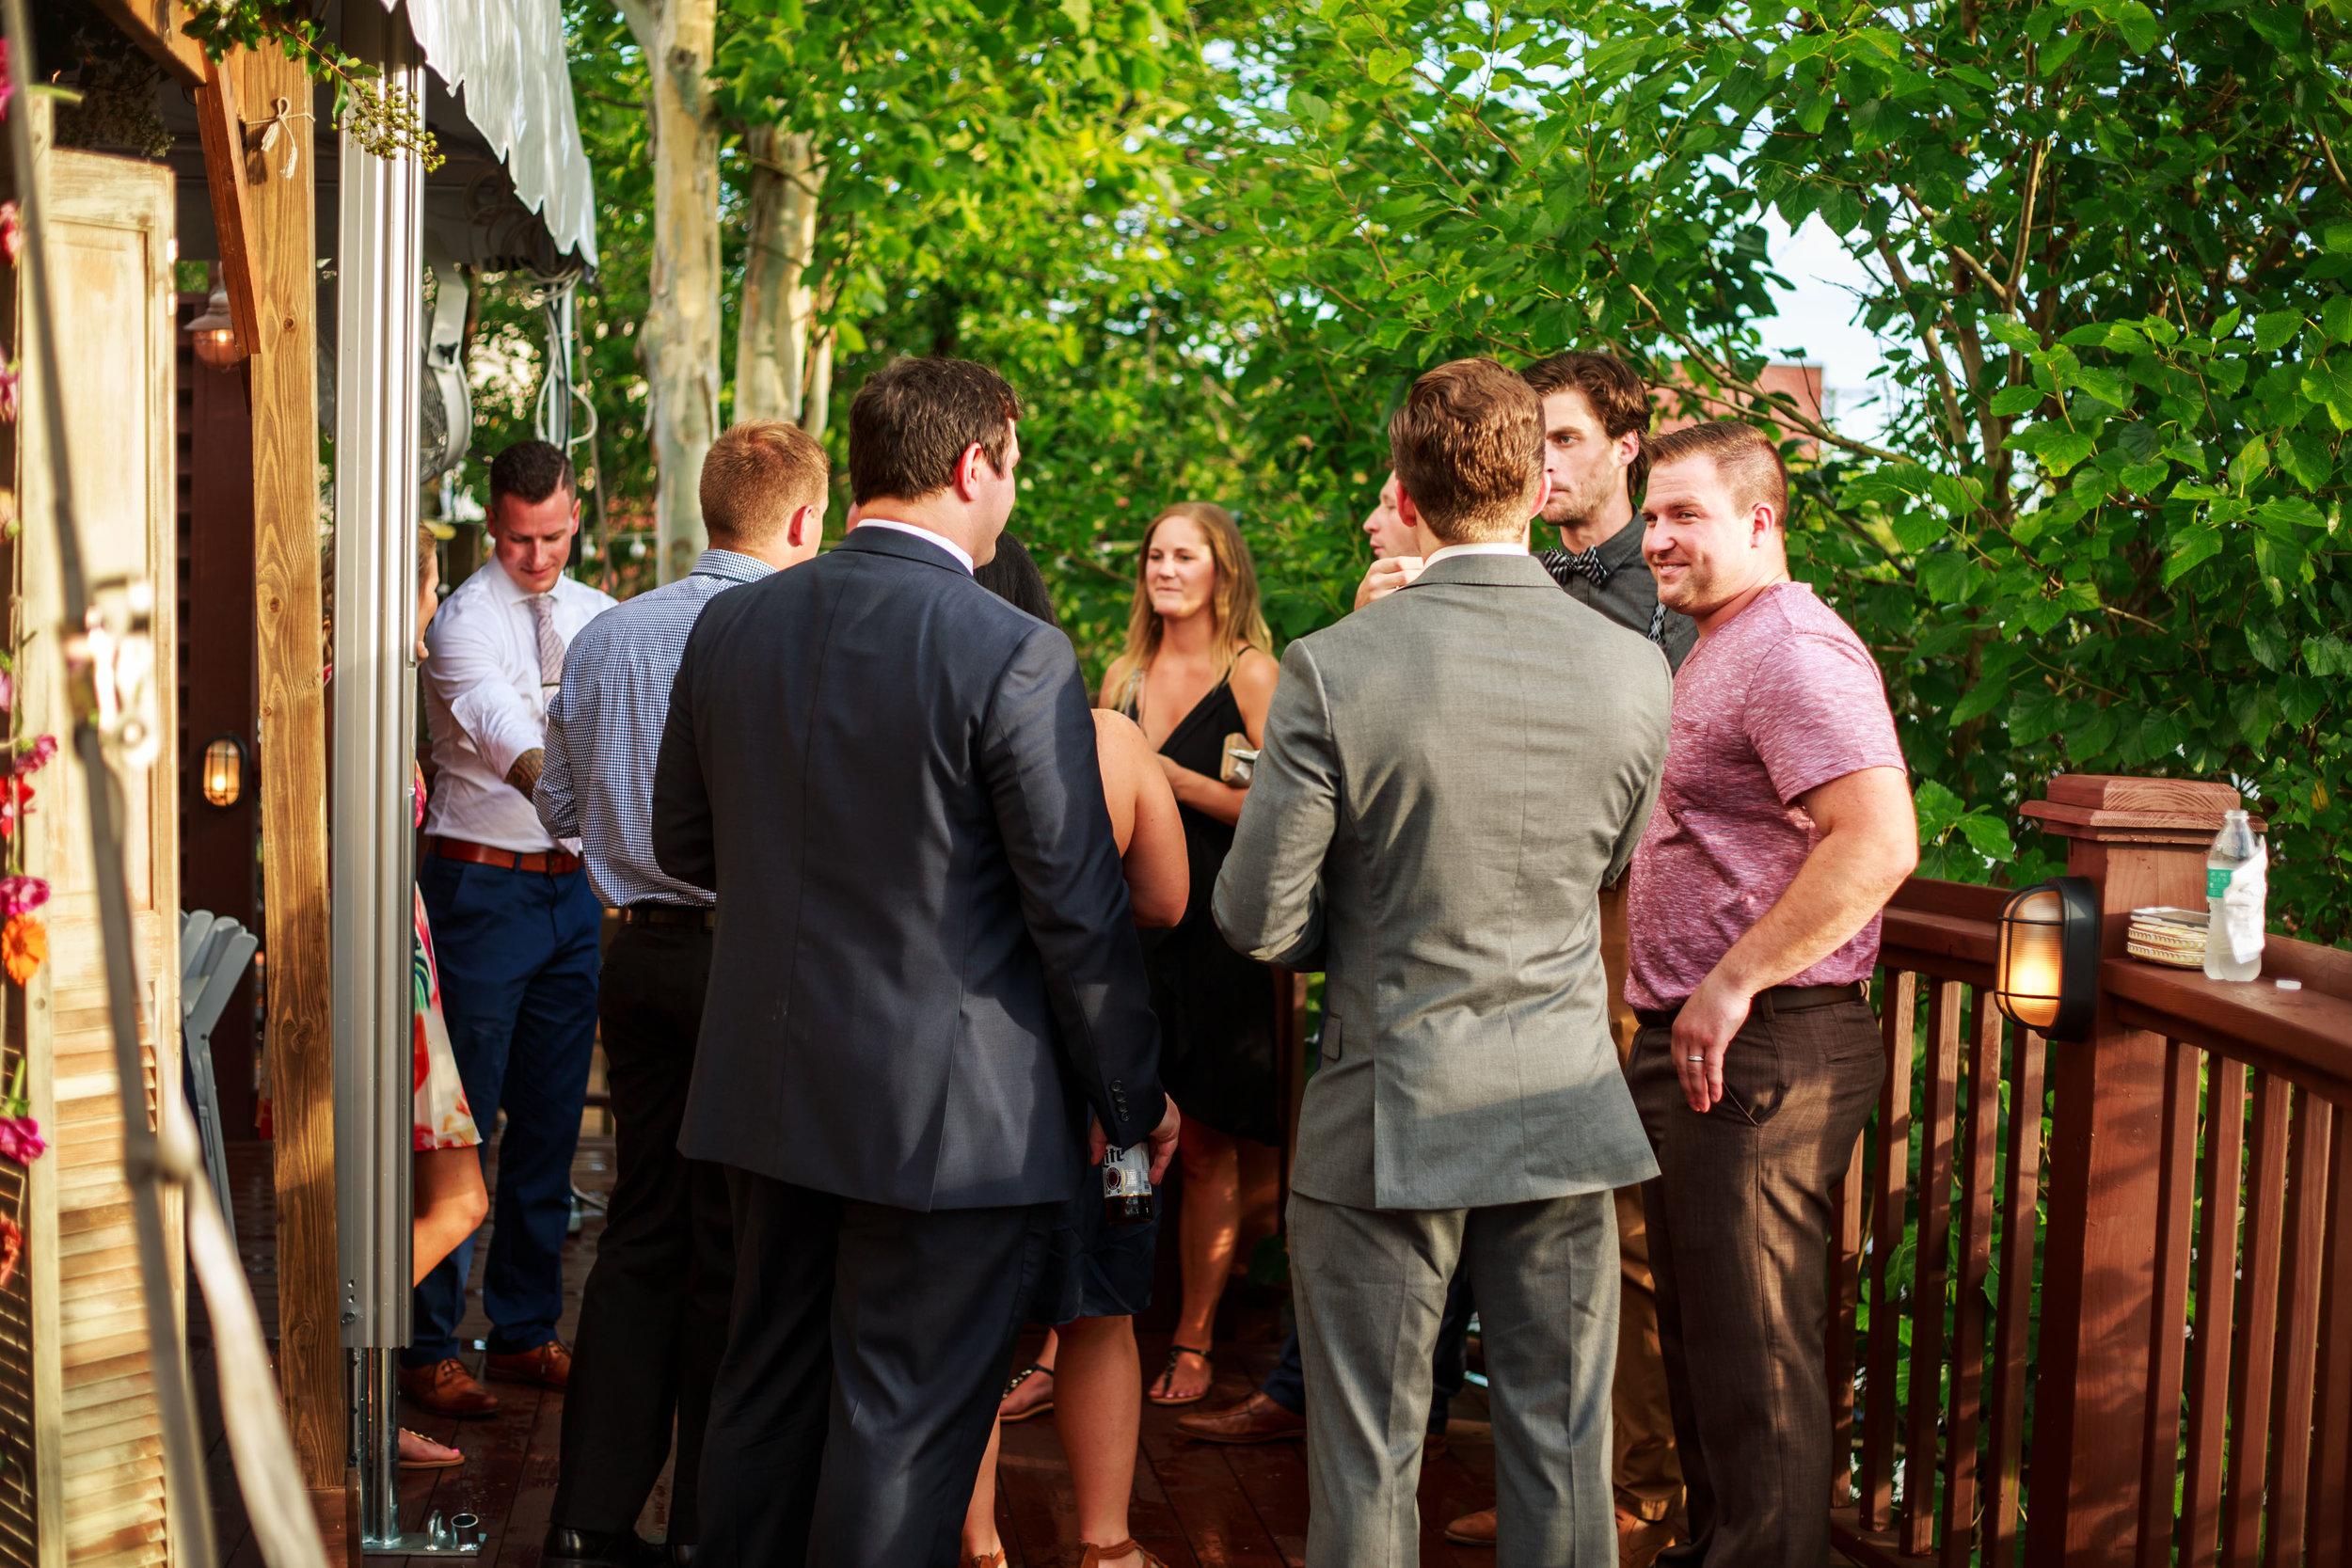 128-South-Wedding-Wilmington-NC-Photographer-Reception-36.jpg